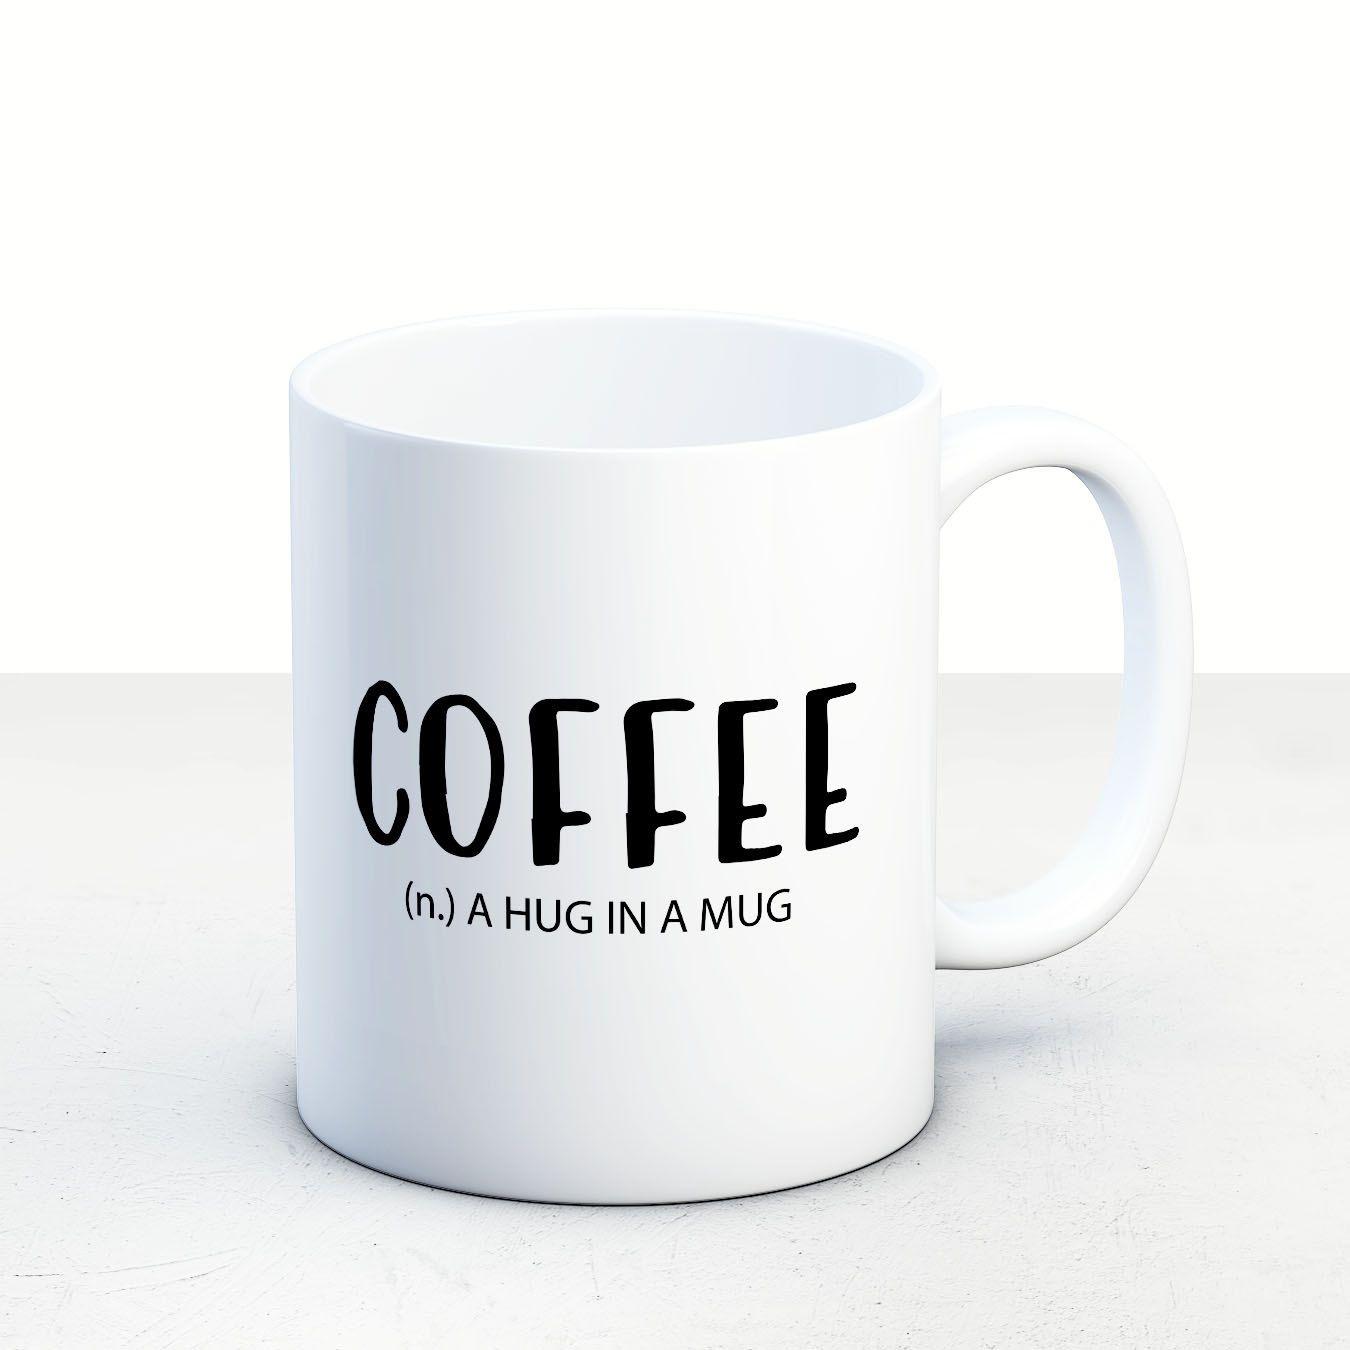 Best Friend Mug Coffee Meaning A Hug In A Mug Statement Mug Inspirational Quote Coffee Cup Happy Mug Hug Mug Canada Friend Mugs Mugs Best Friend Mug